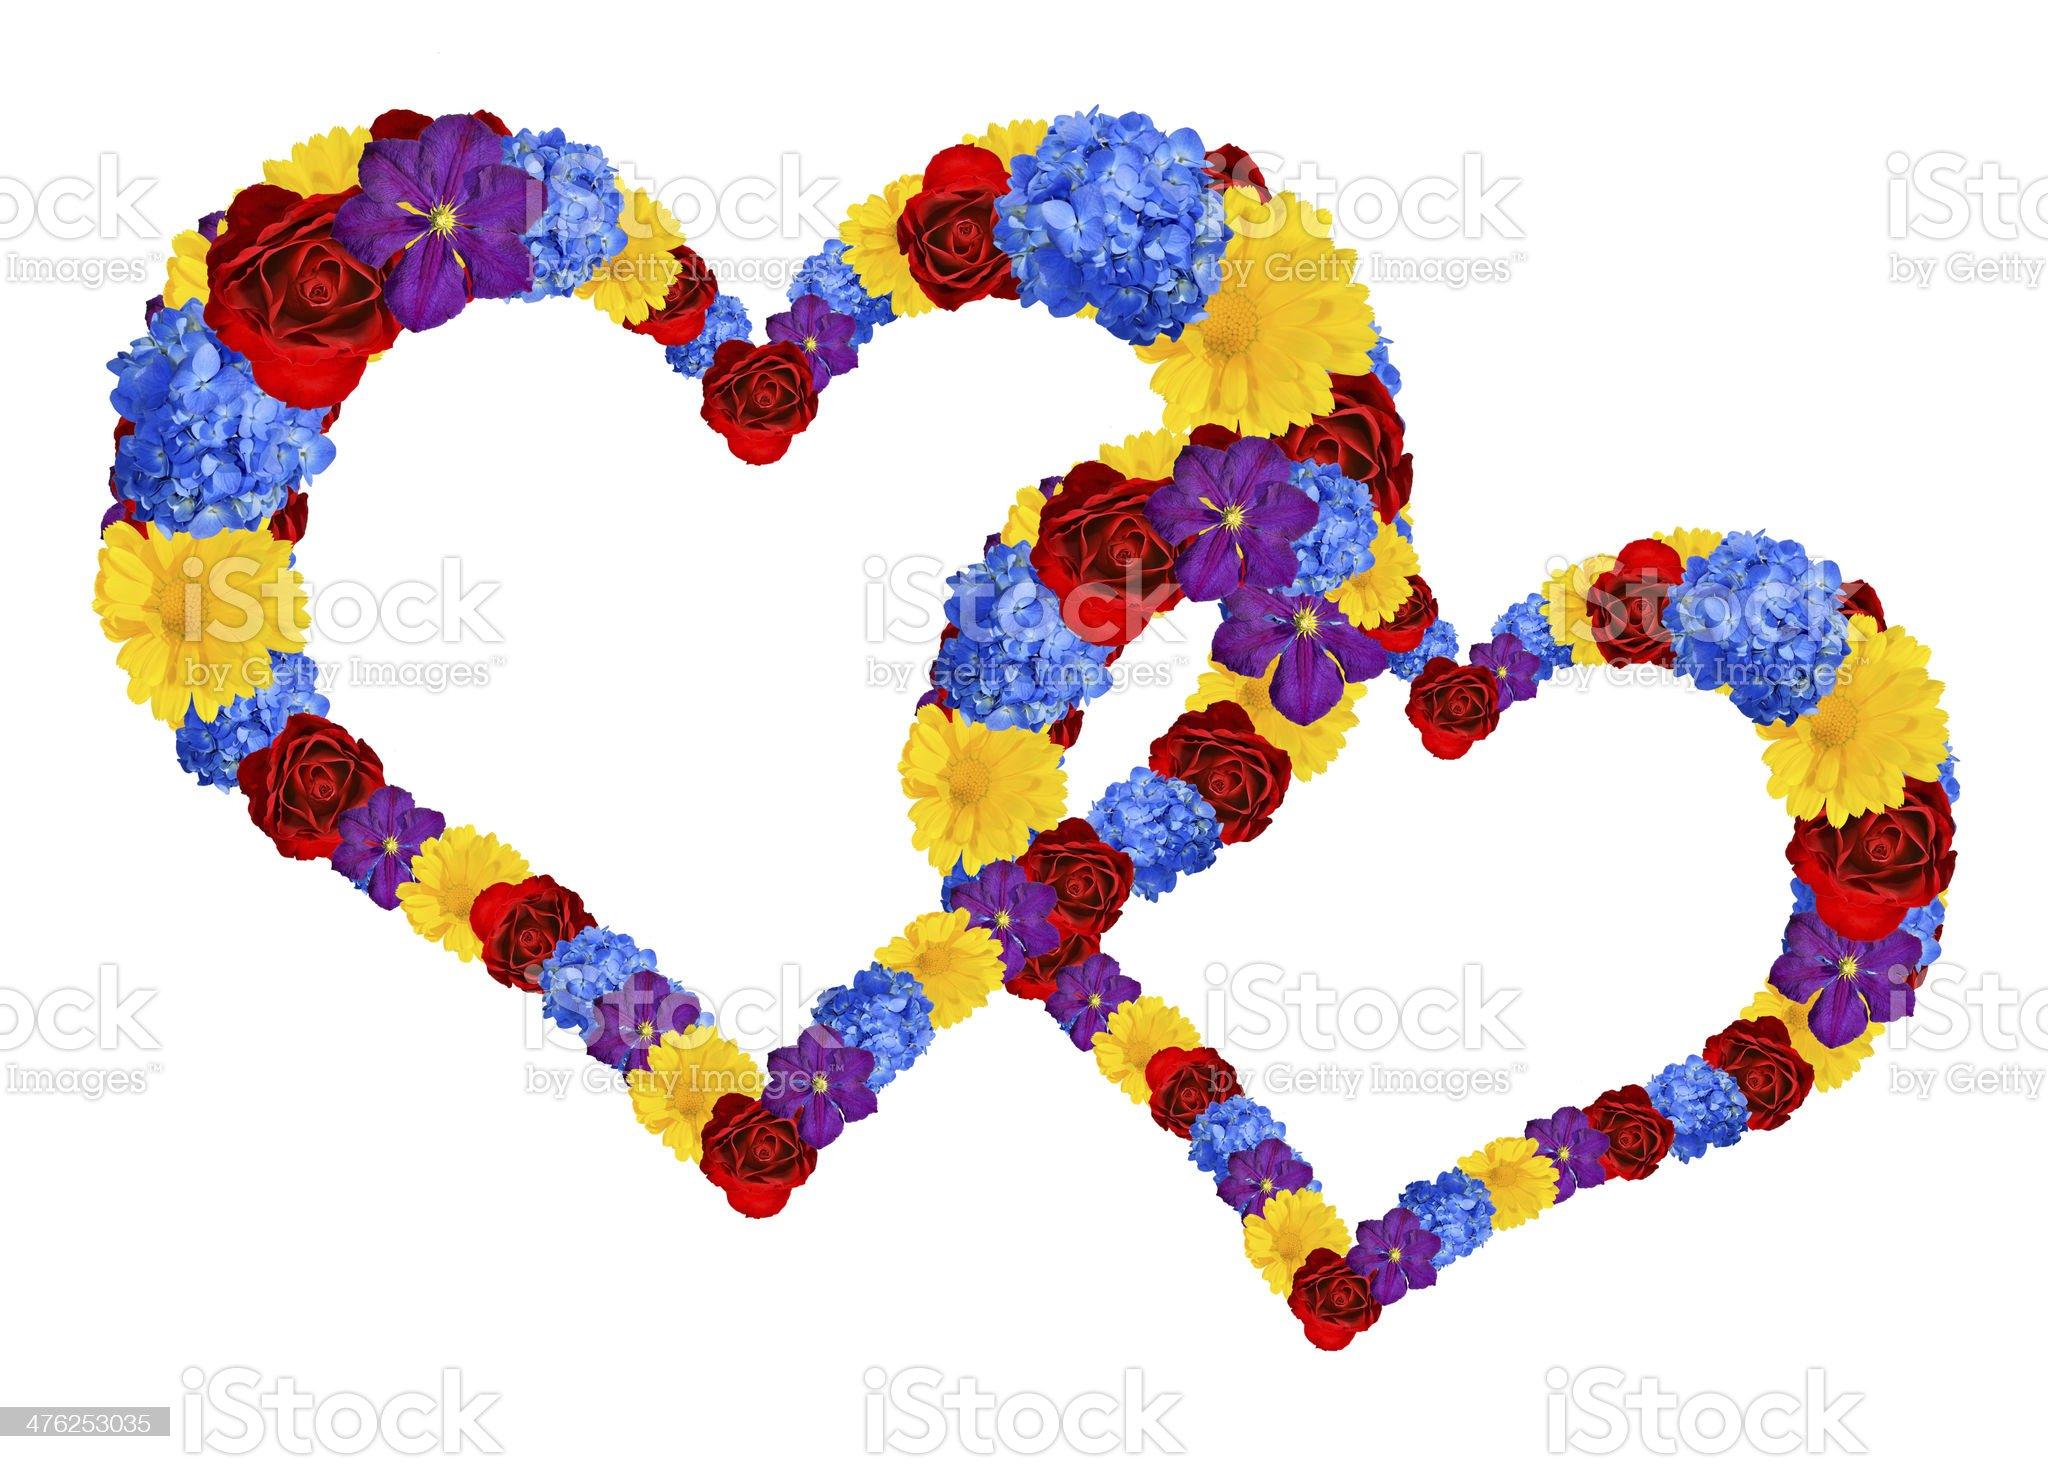 flower heart royalty-free stock photo